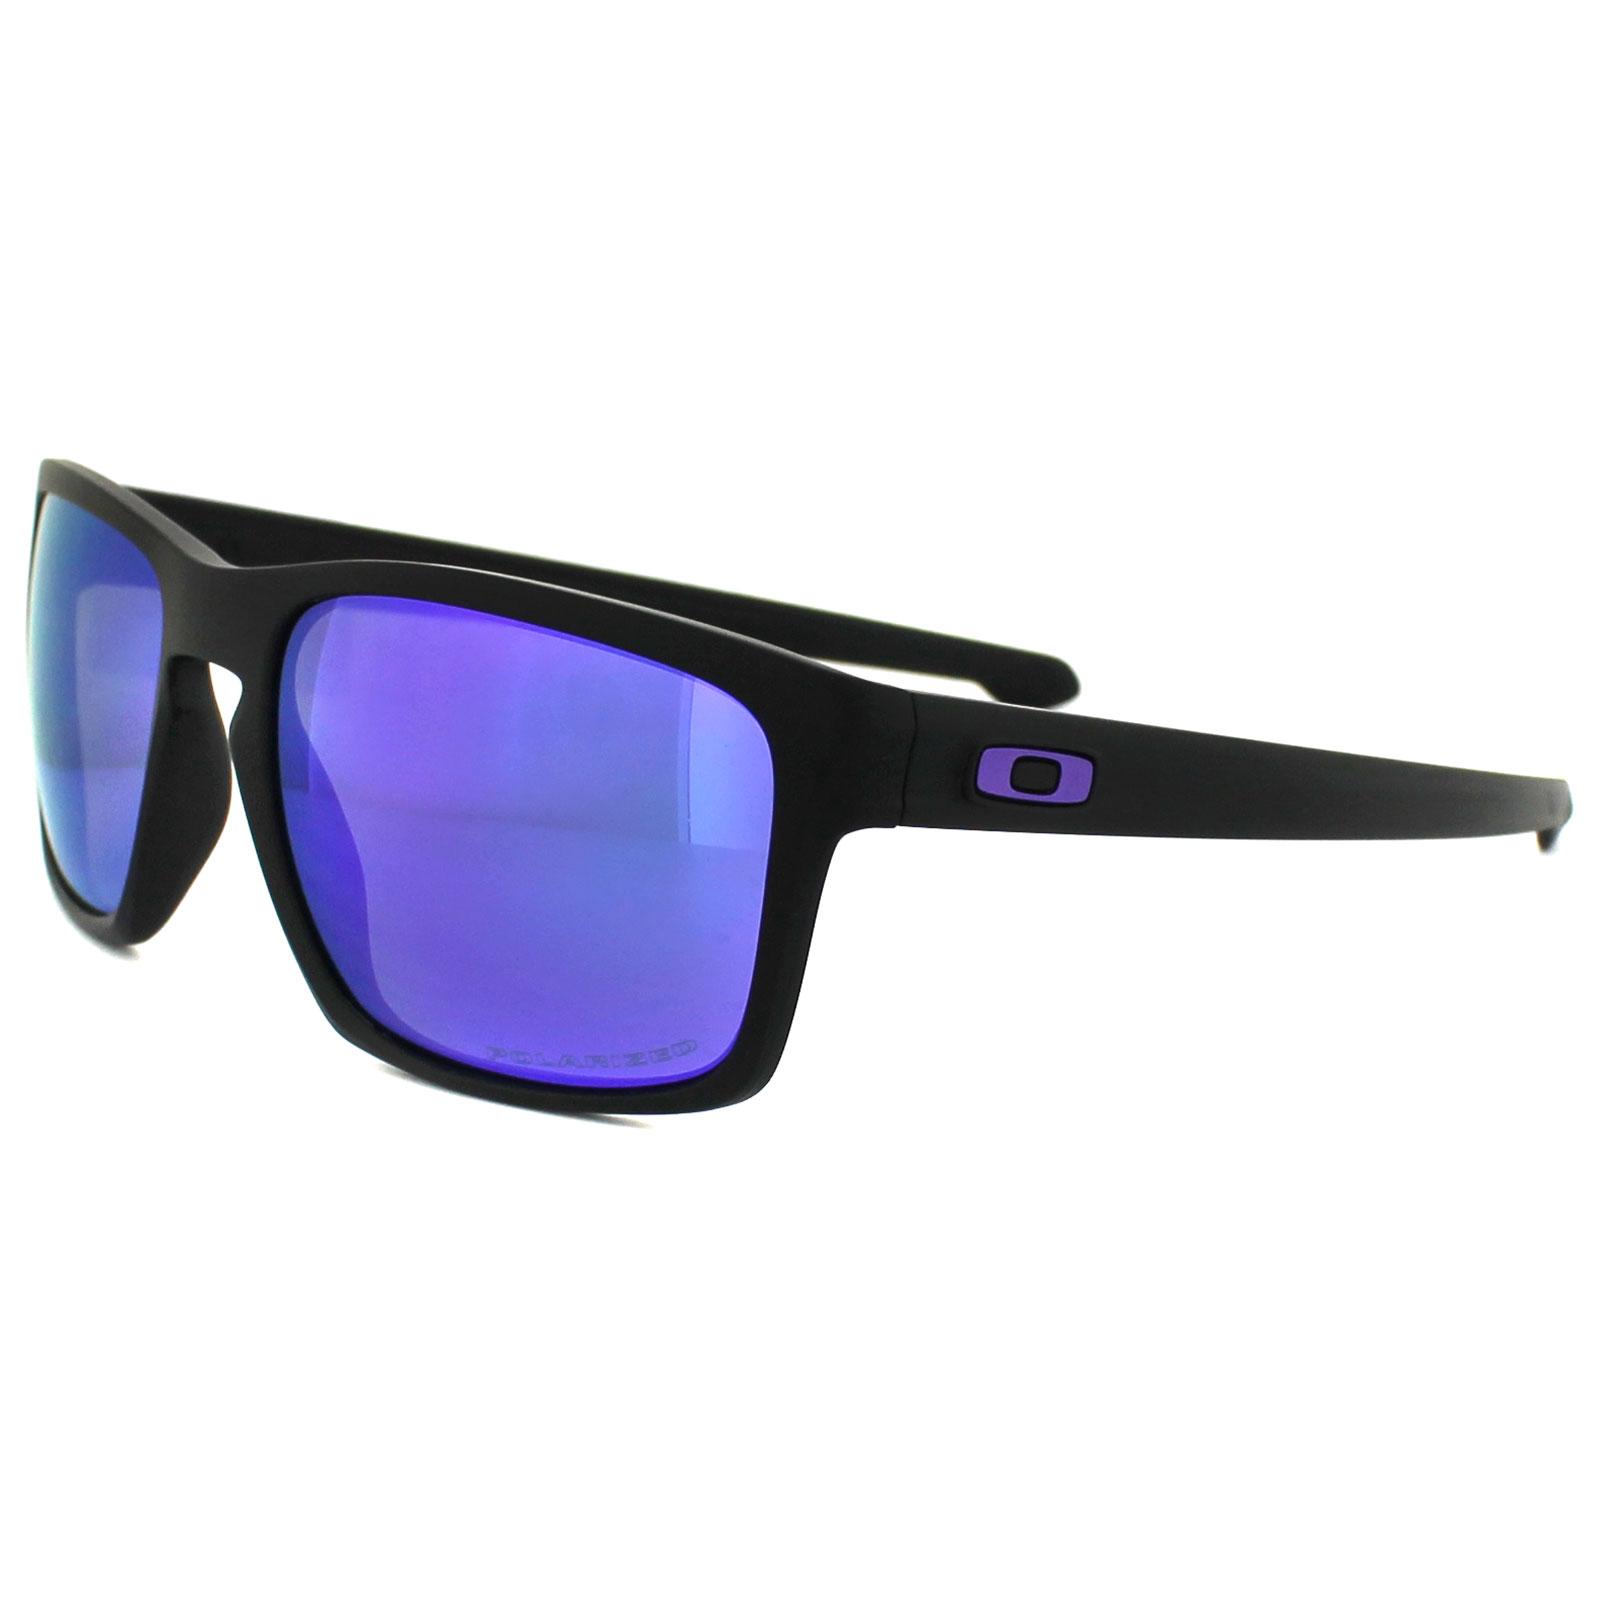 Sentinel Oakley Sunglasses Sliver OO9262-10 Matt Black Violet Iridium  Polarized 6d51ef07ab